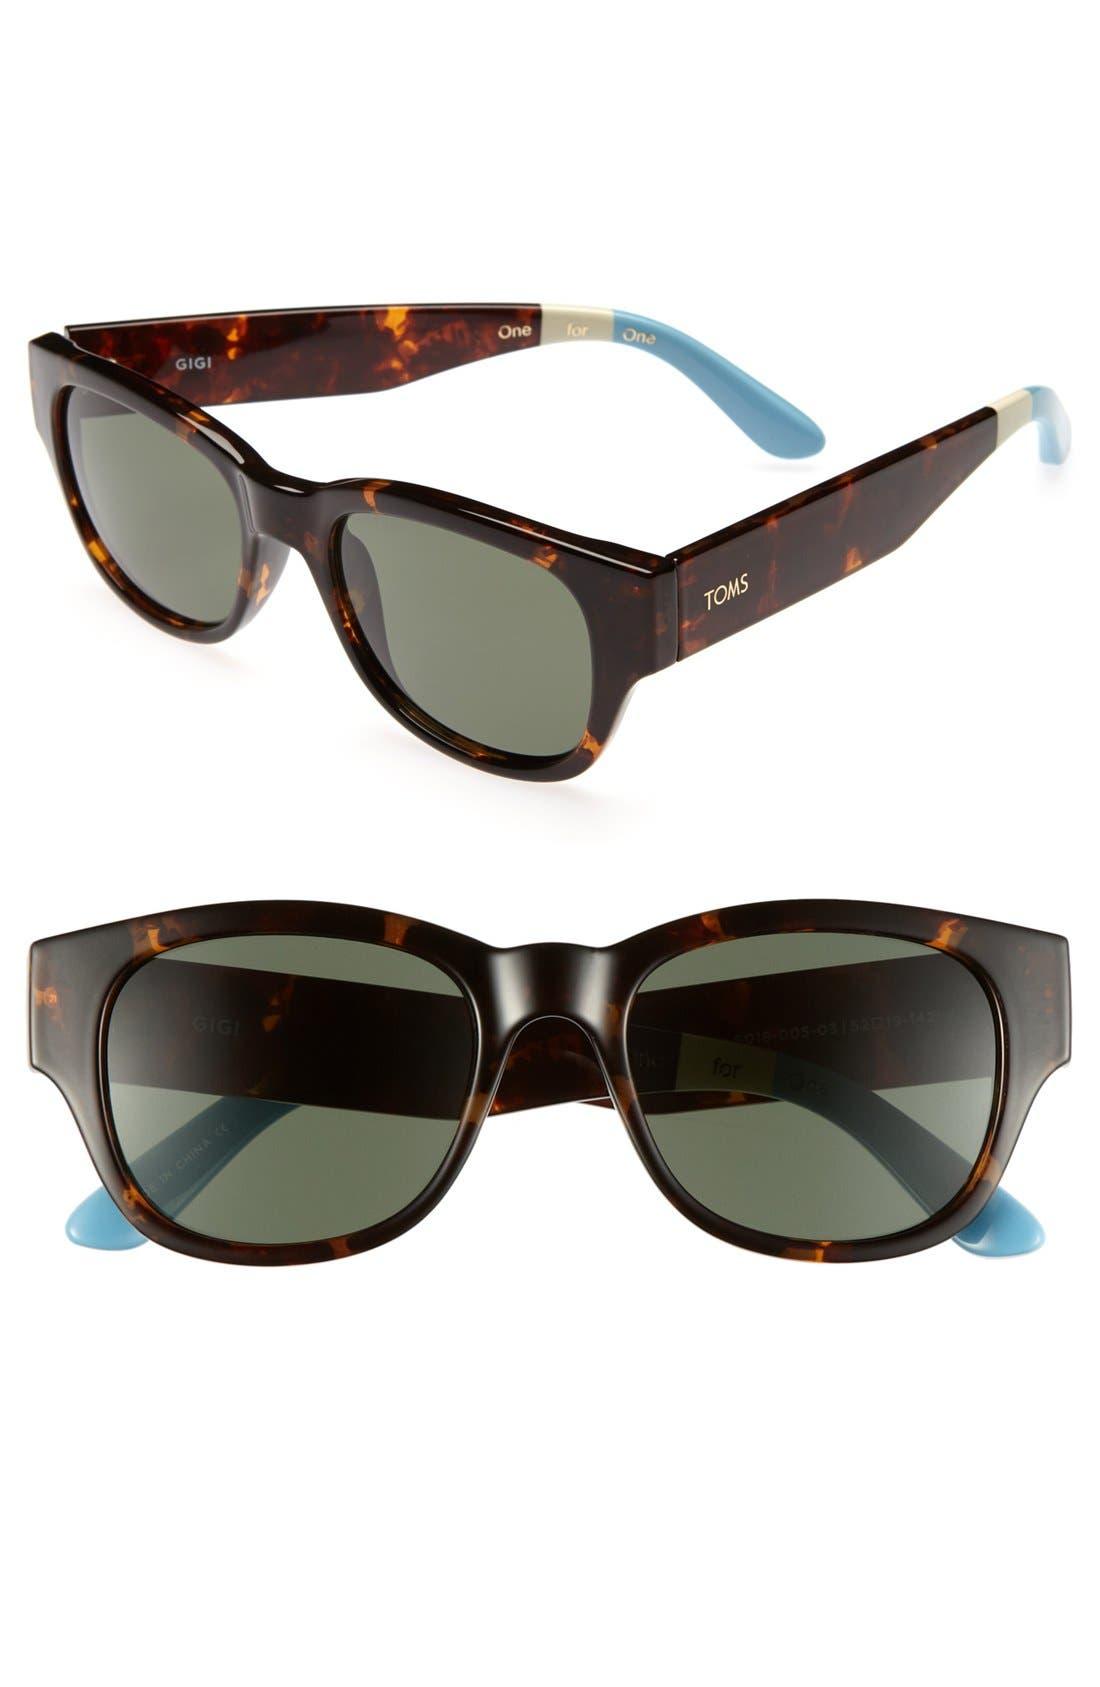 Main Image - TOMS 'Gigi' 52mm Sunglasses